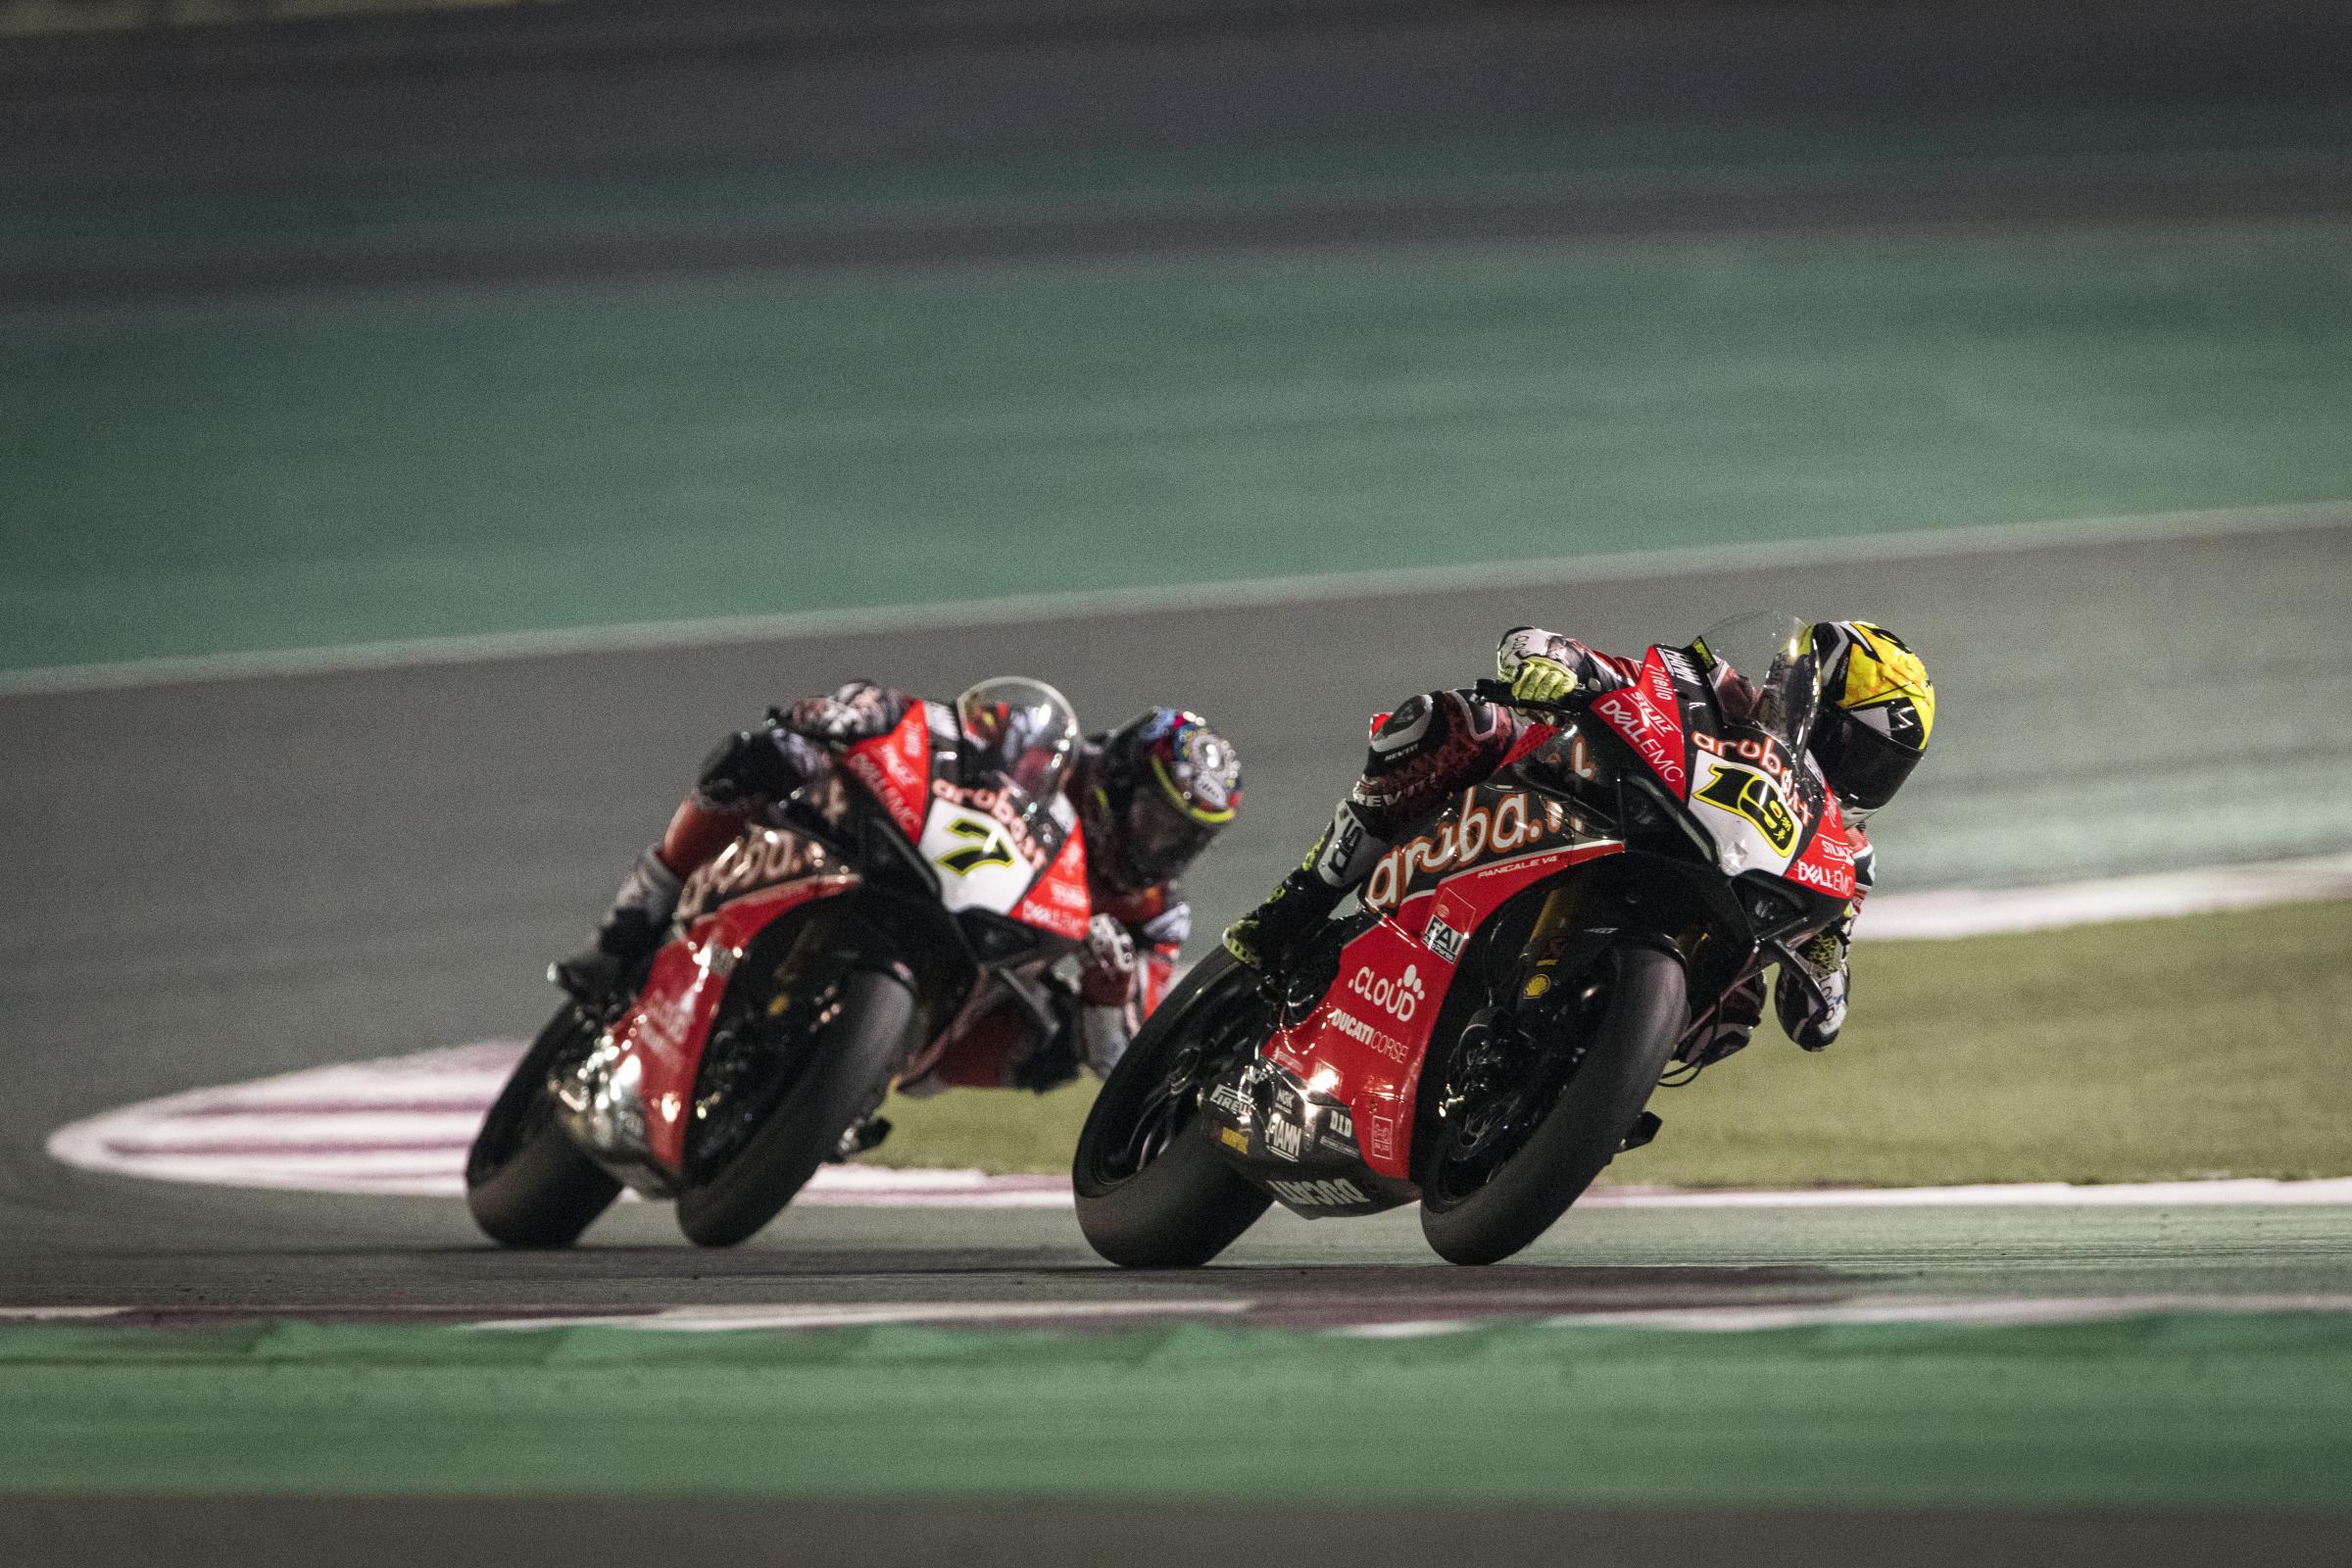 Presteigne star Davies ends Superbike campaign on a high in Qatar